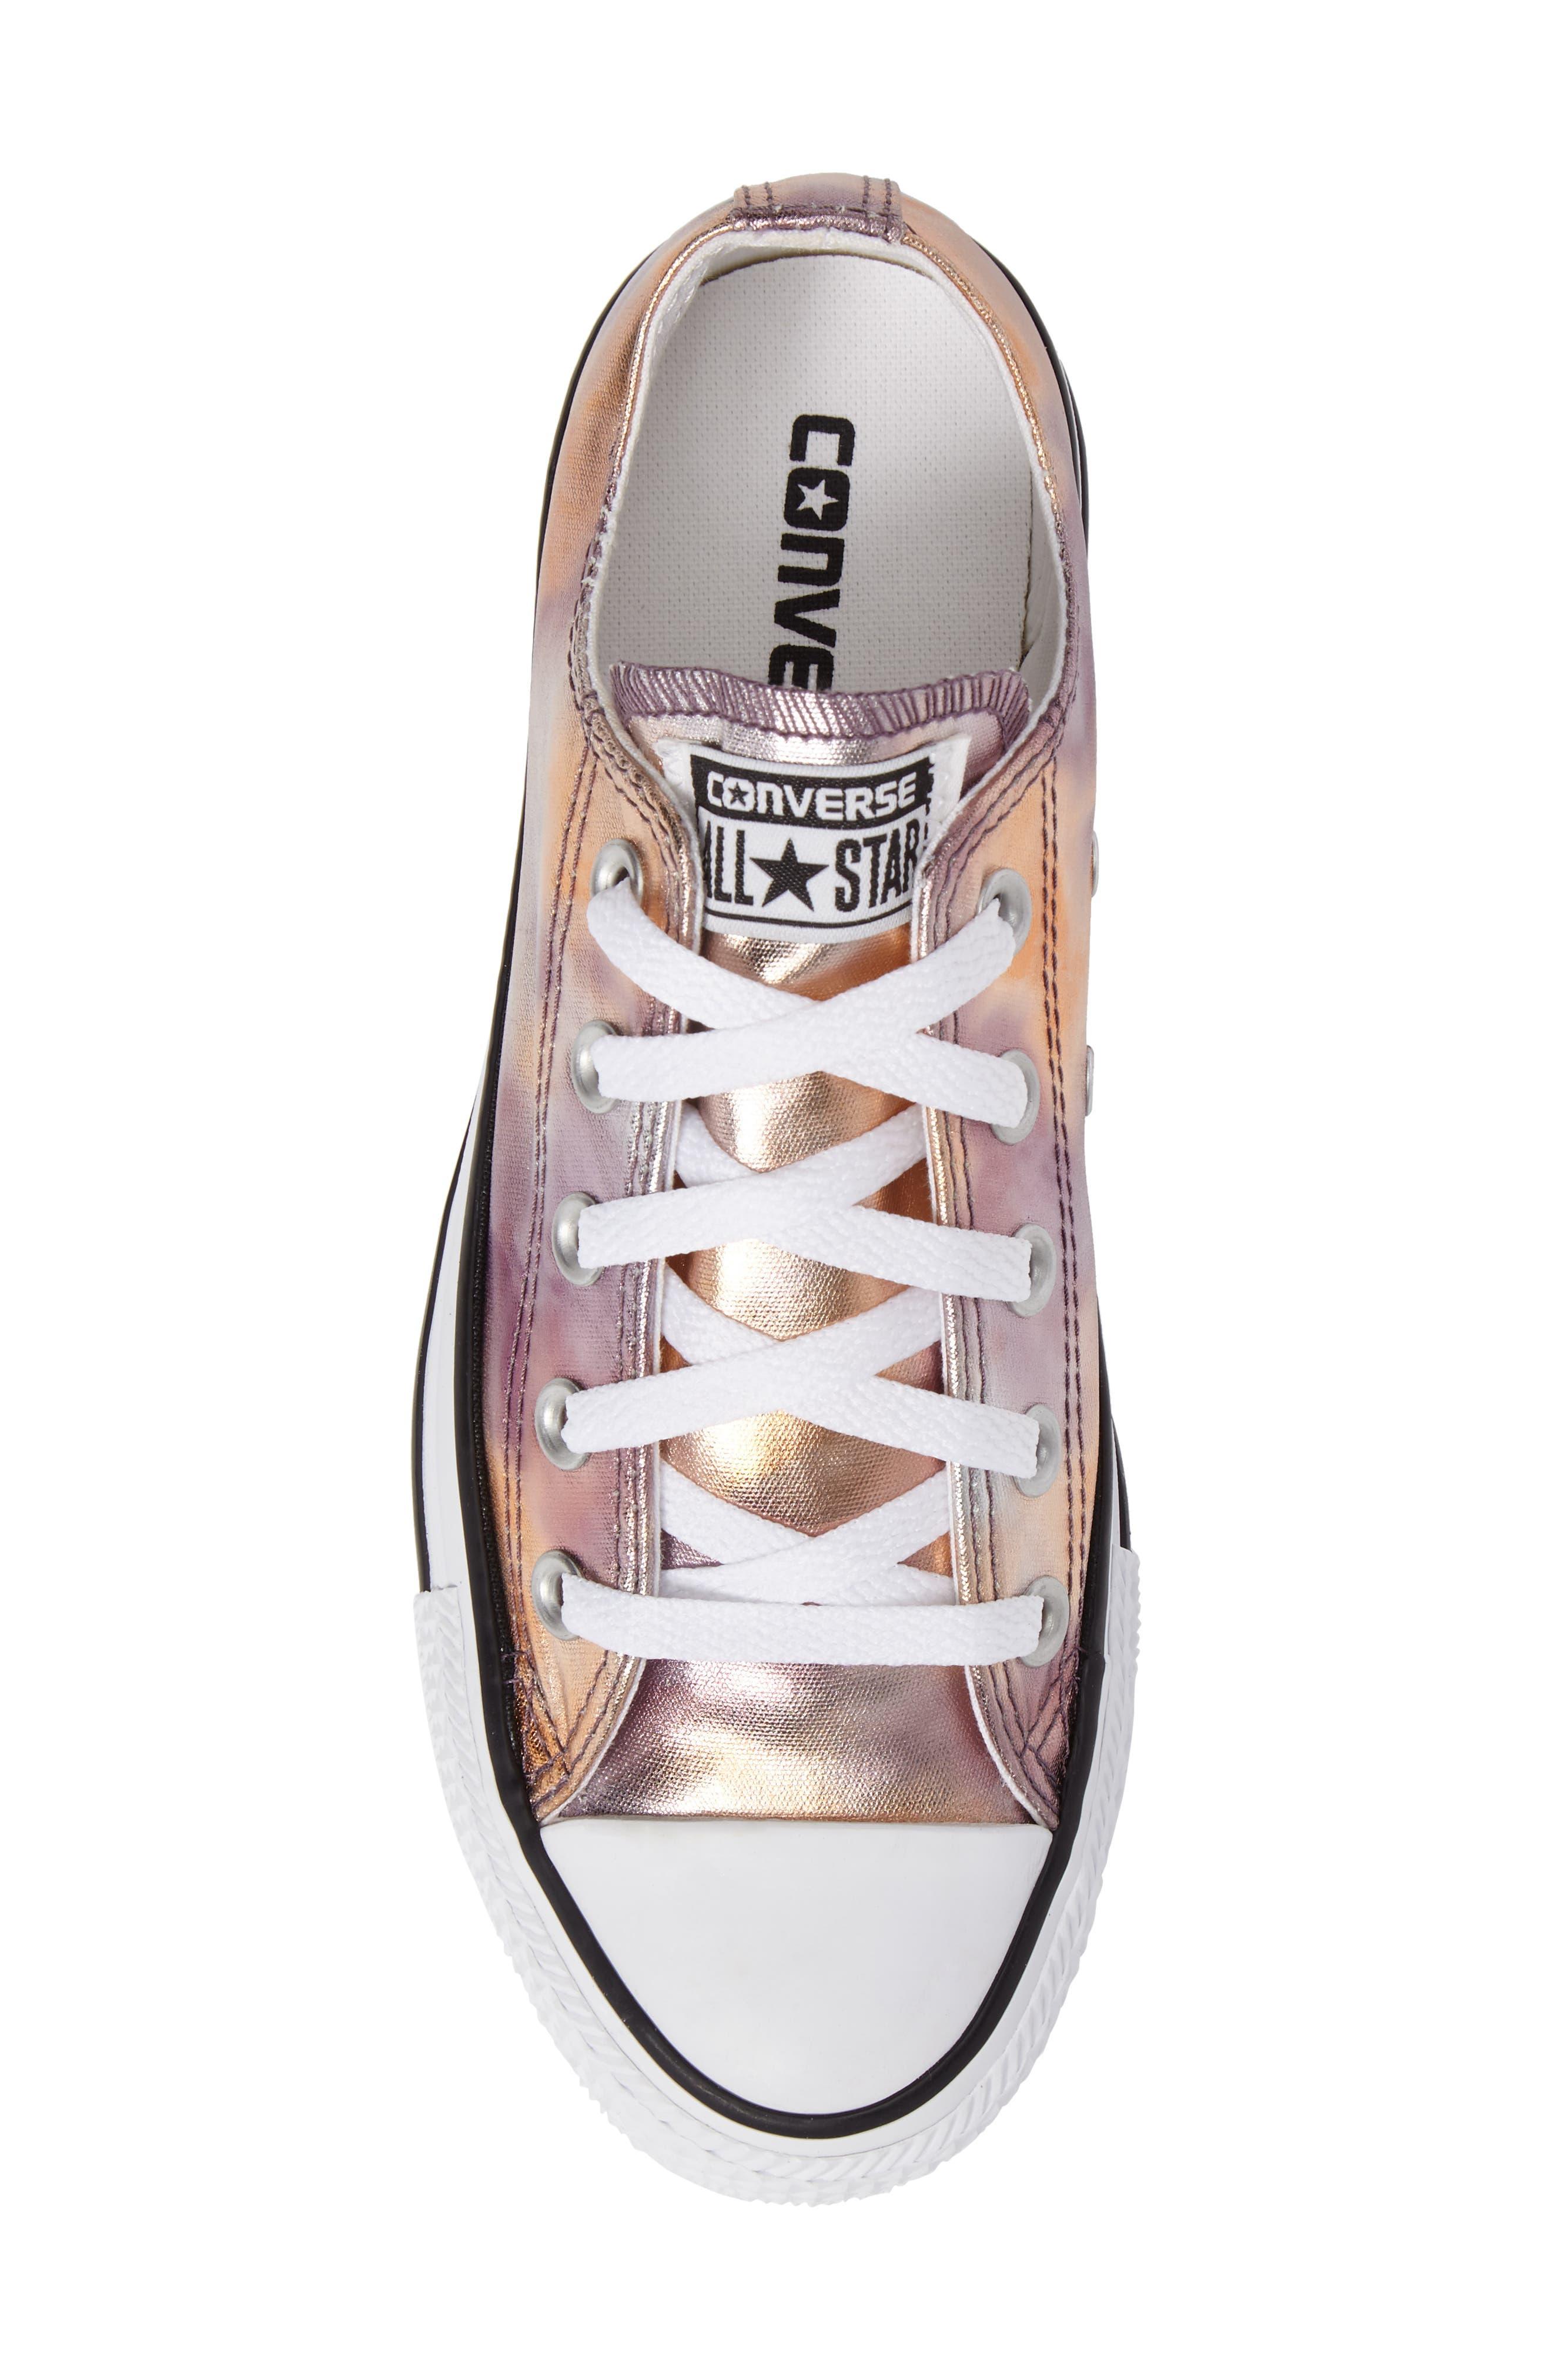 Chuck Taylor<sup>®</sup> All Star<sup>®</sup> Seasonal Metallic Ox Low Top Sneaker,                             Alternate thumbnail 5, color,                             Dusk Pink